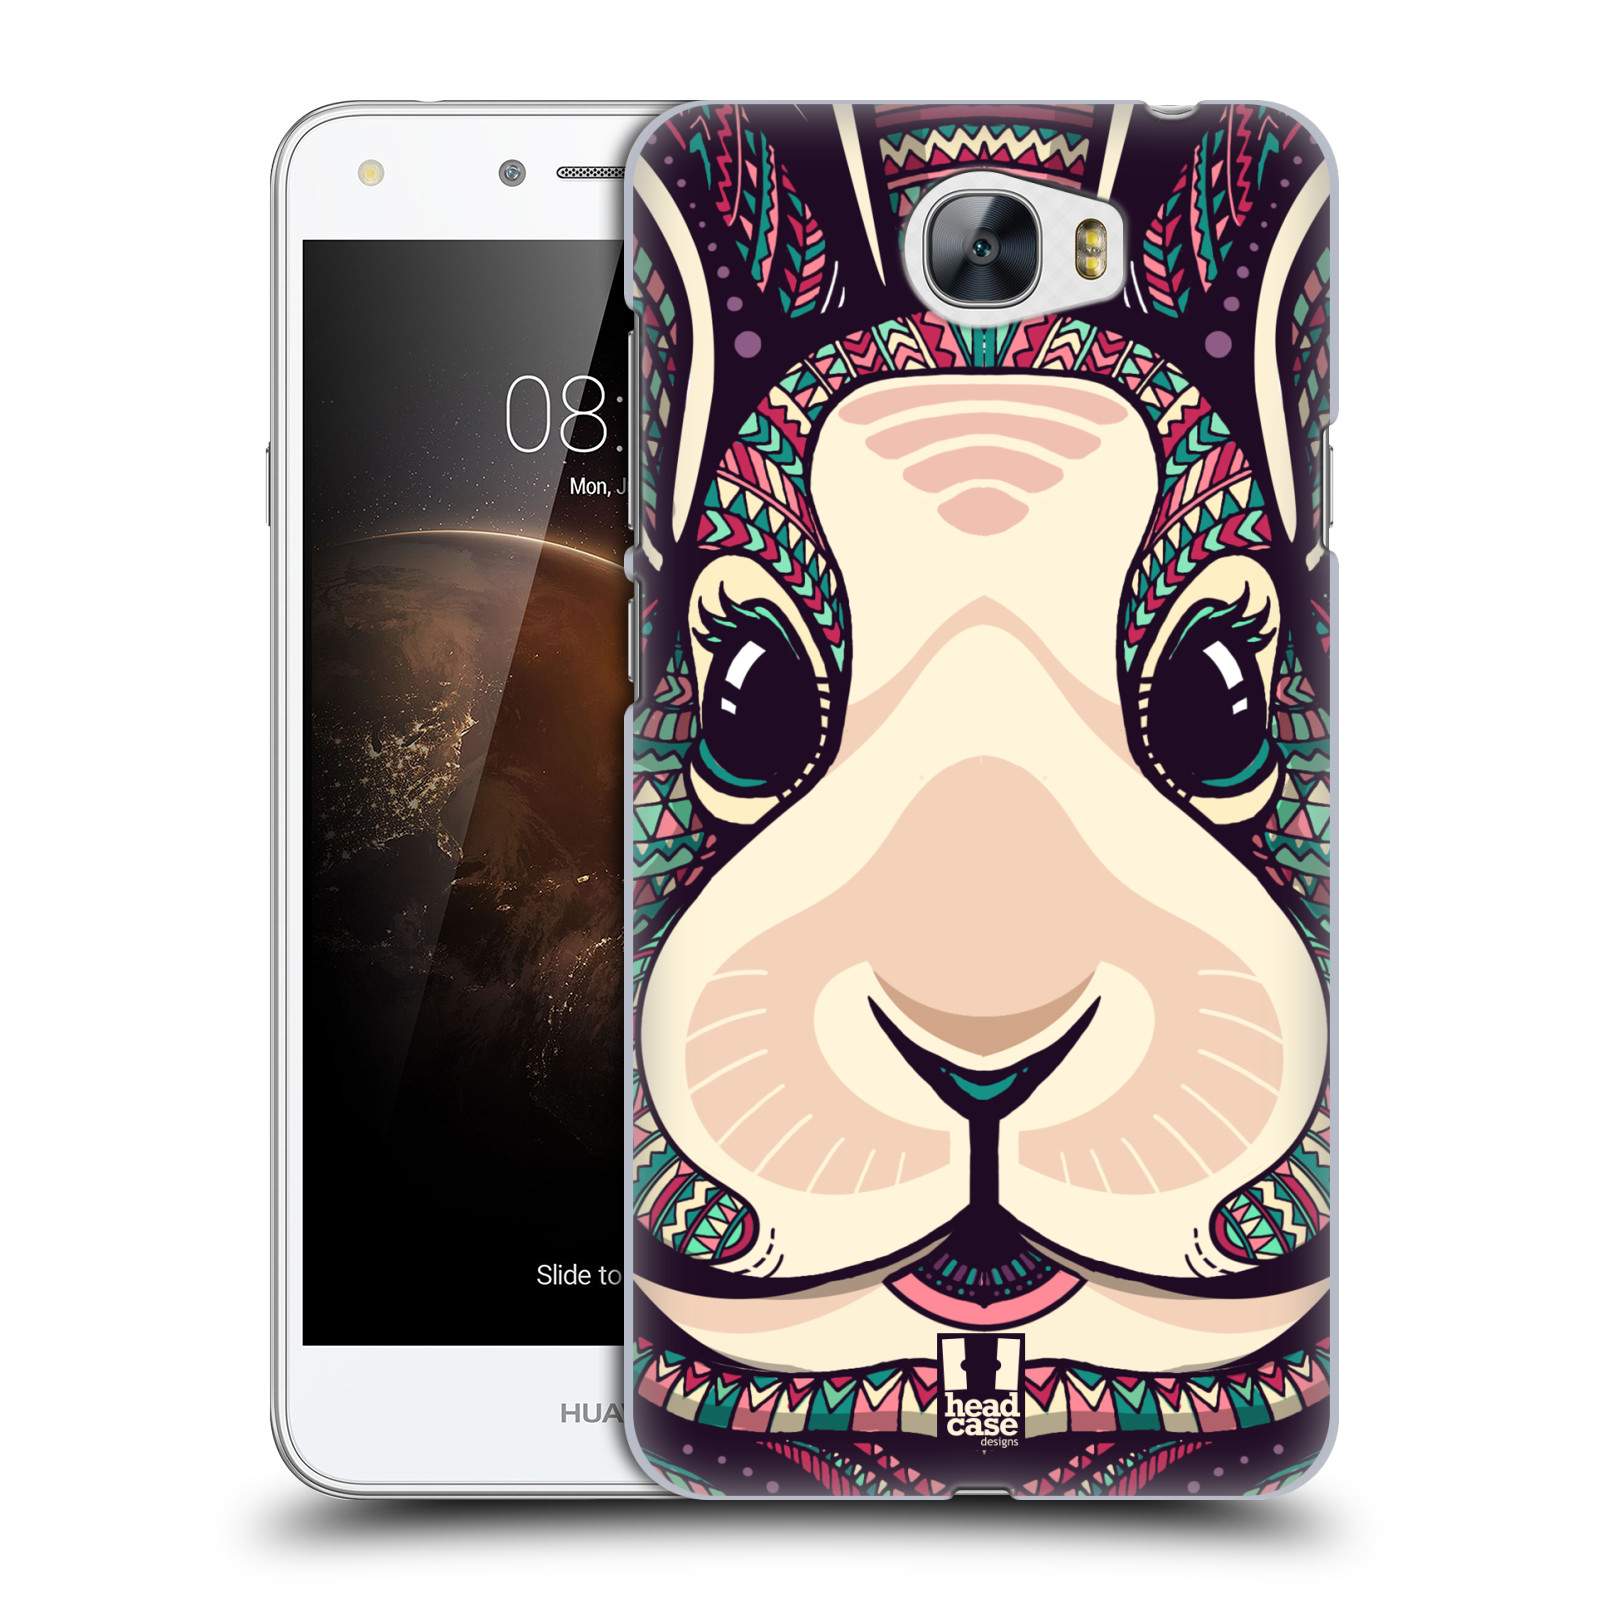 Plastové pouzdro na mobil Huawei Y5 II HEAD CASE AZTEC ZAJÍČEK